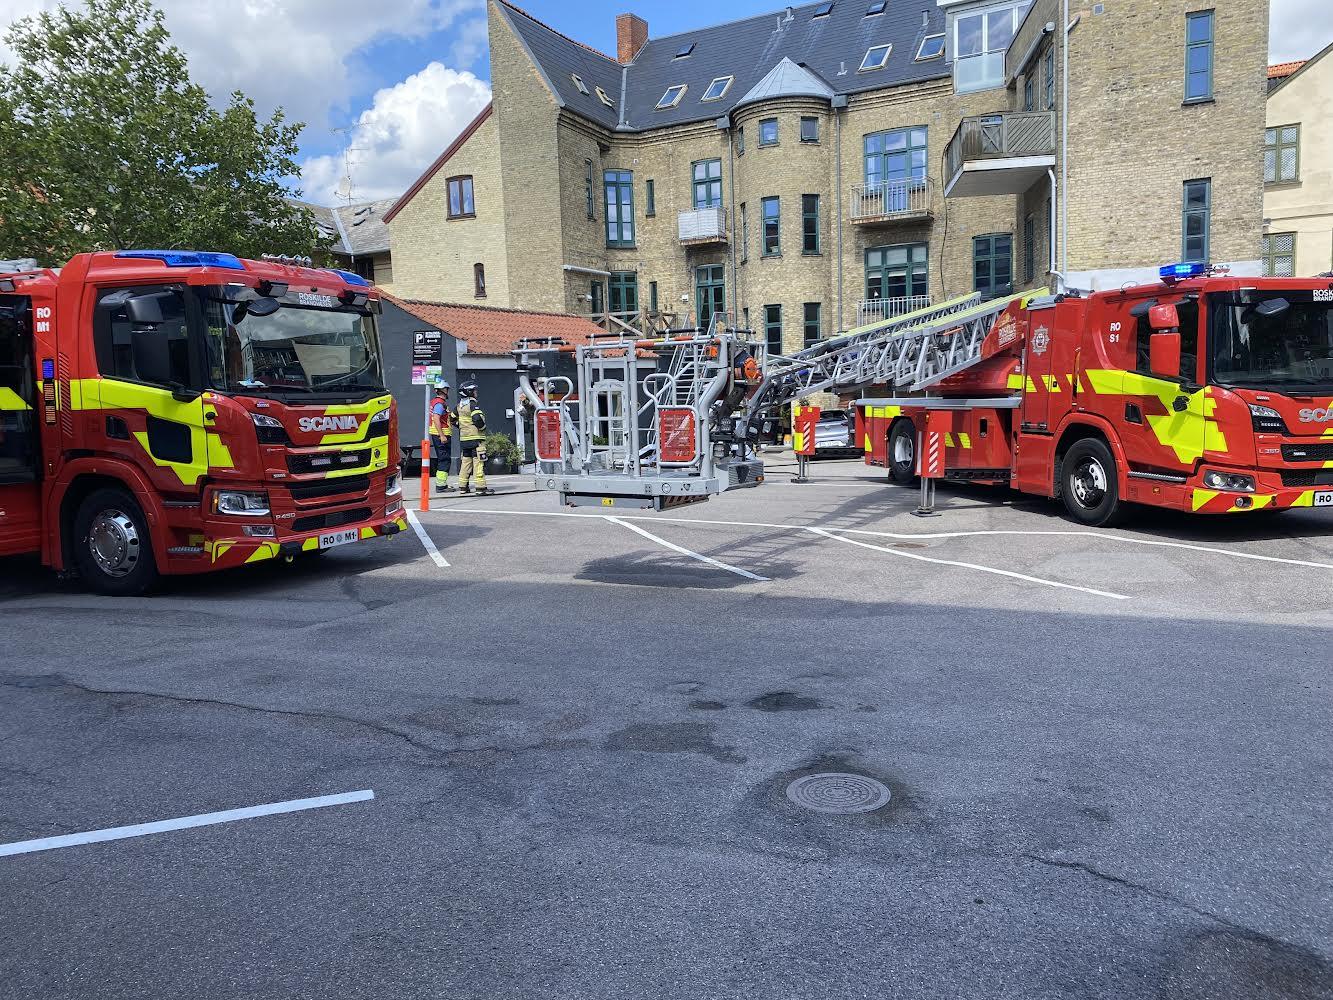 Brand i altan i Roskilde